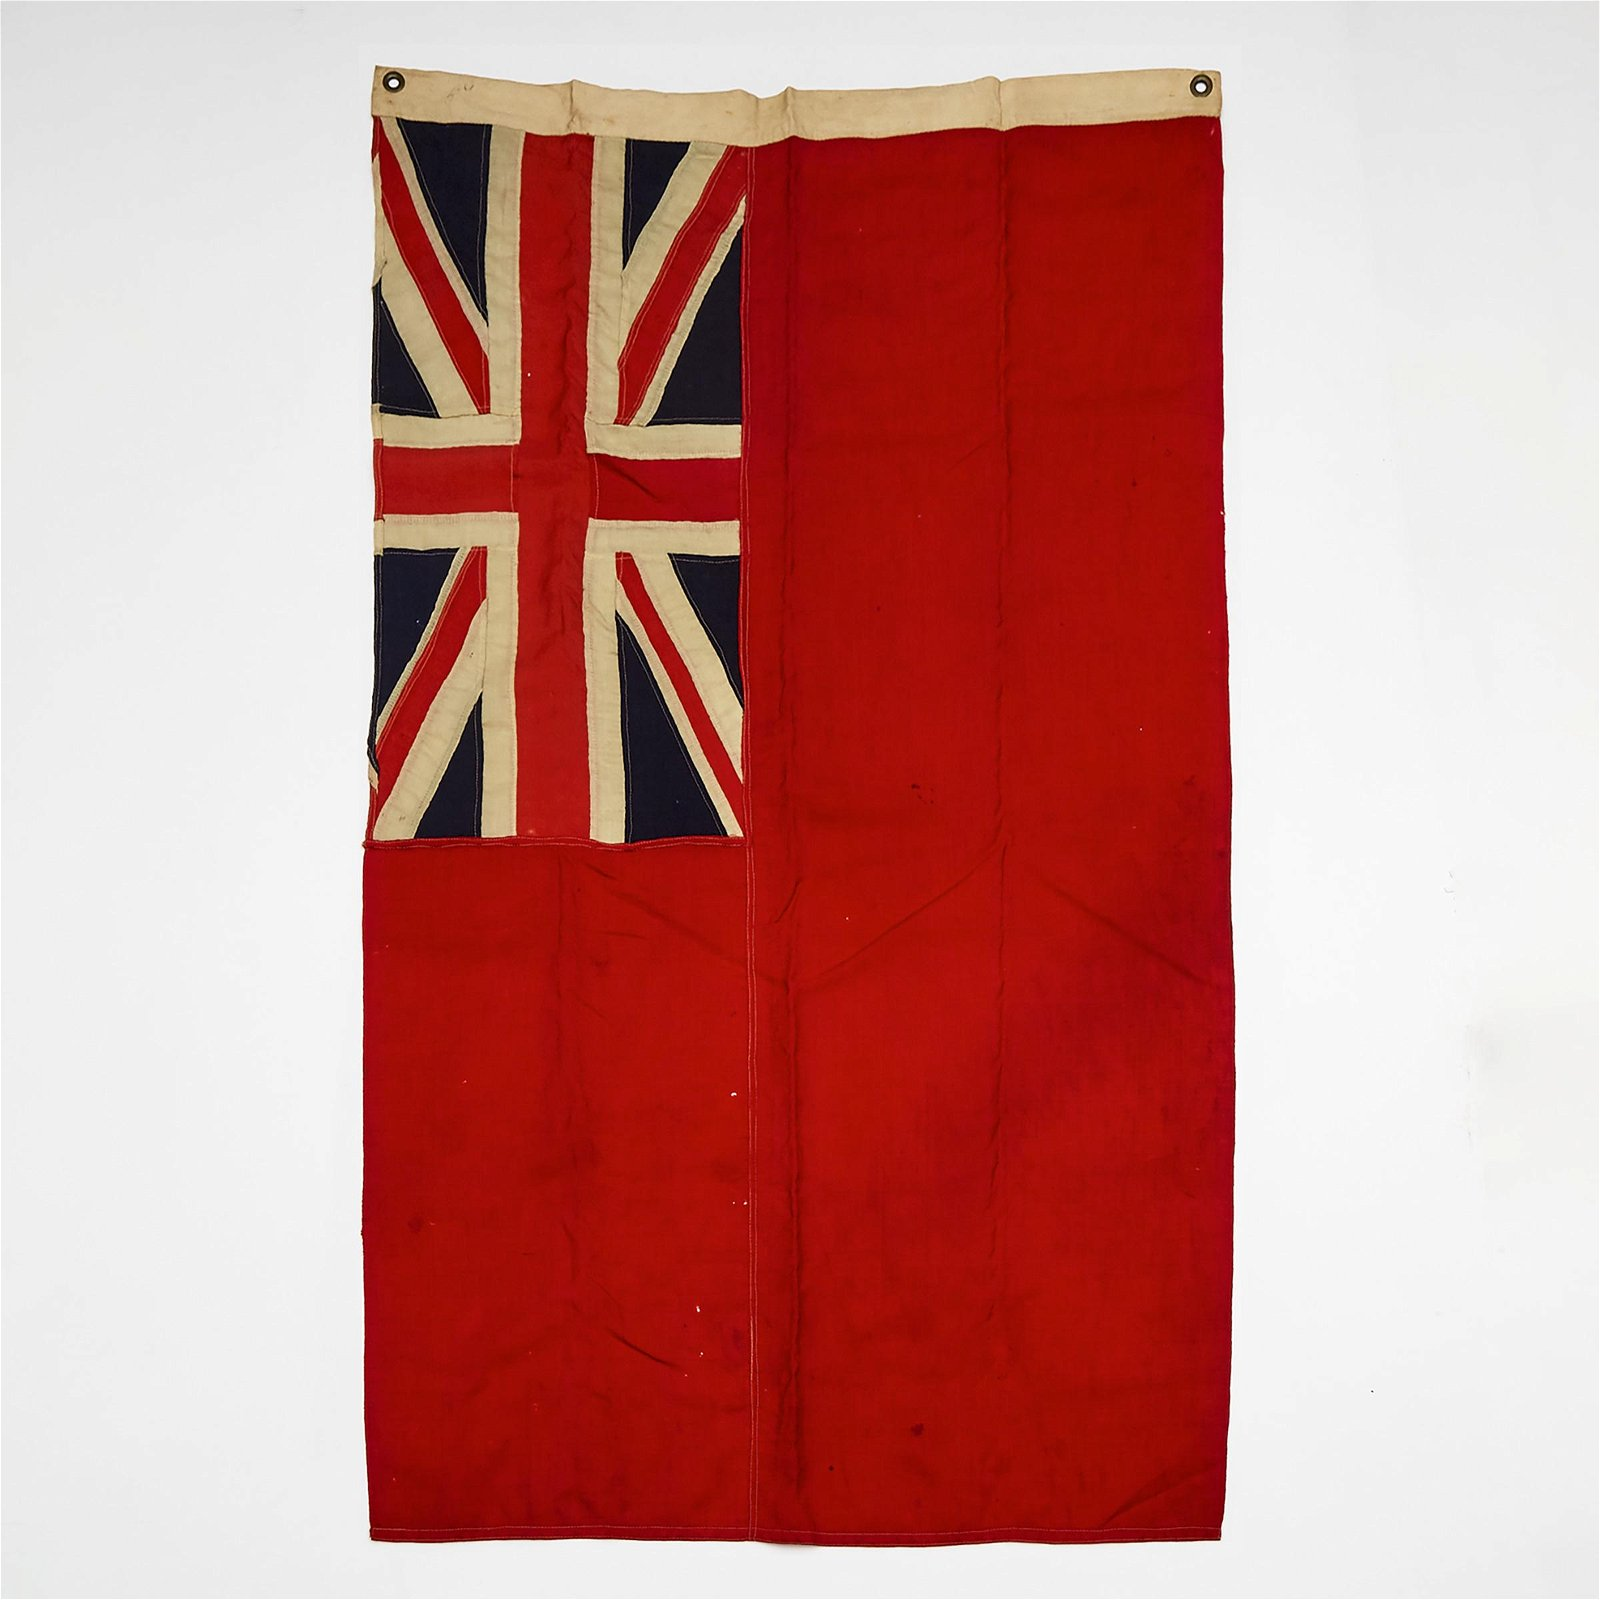 British Merchant Marine Ensign, late 19th century